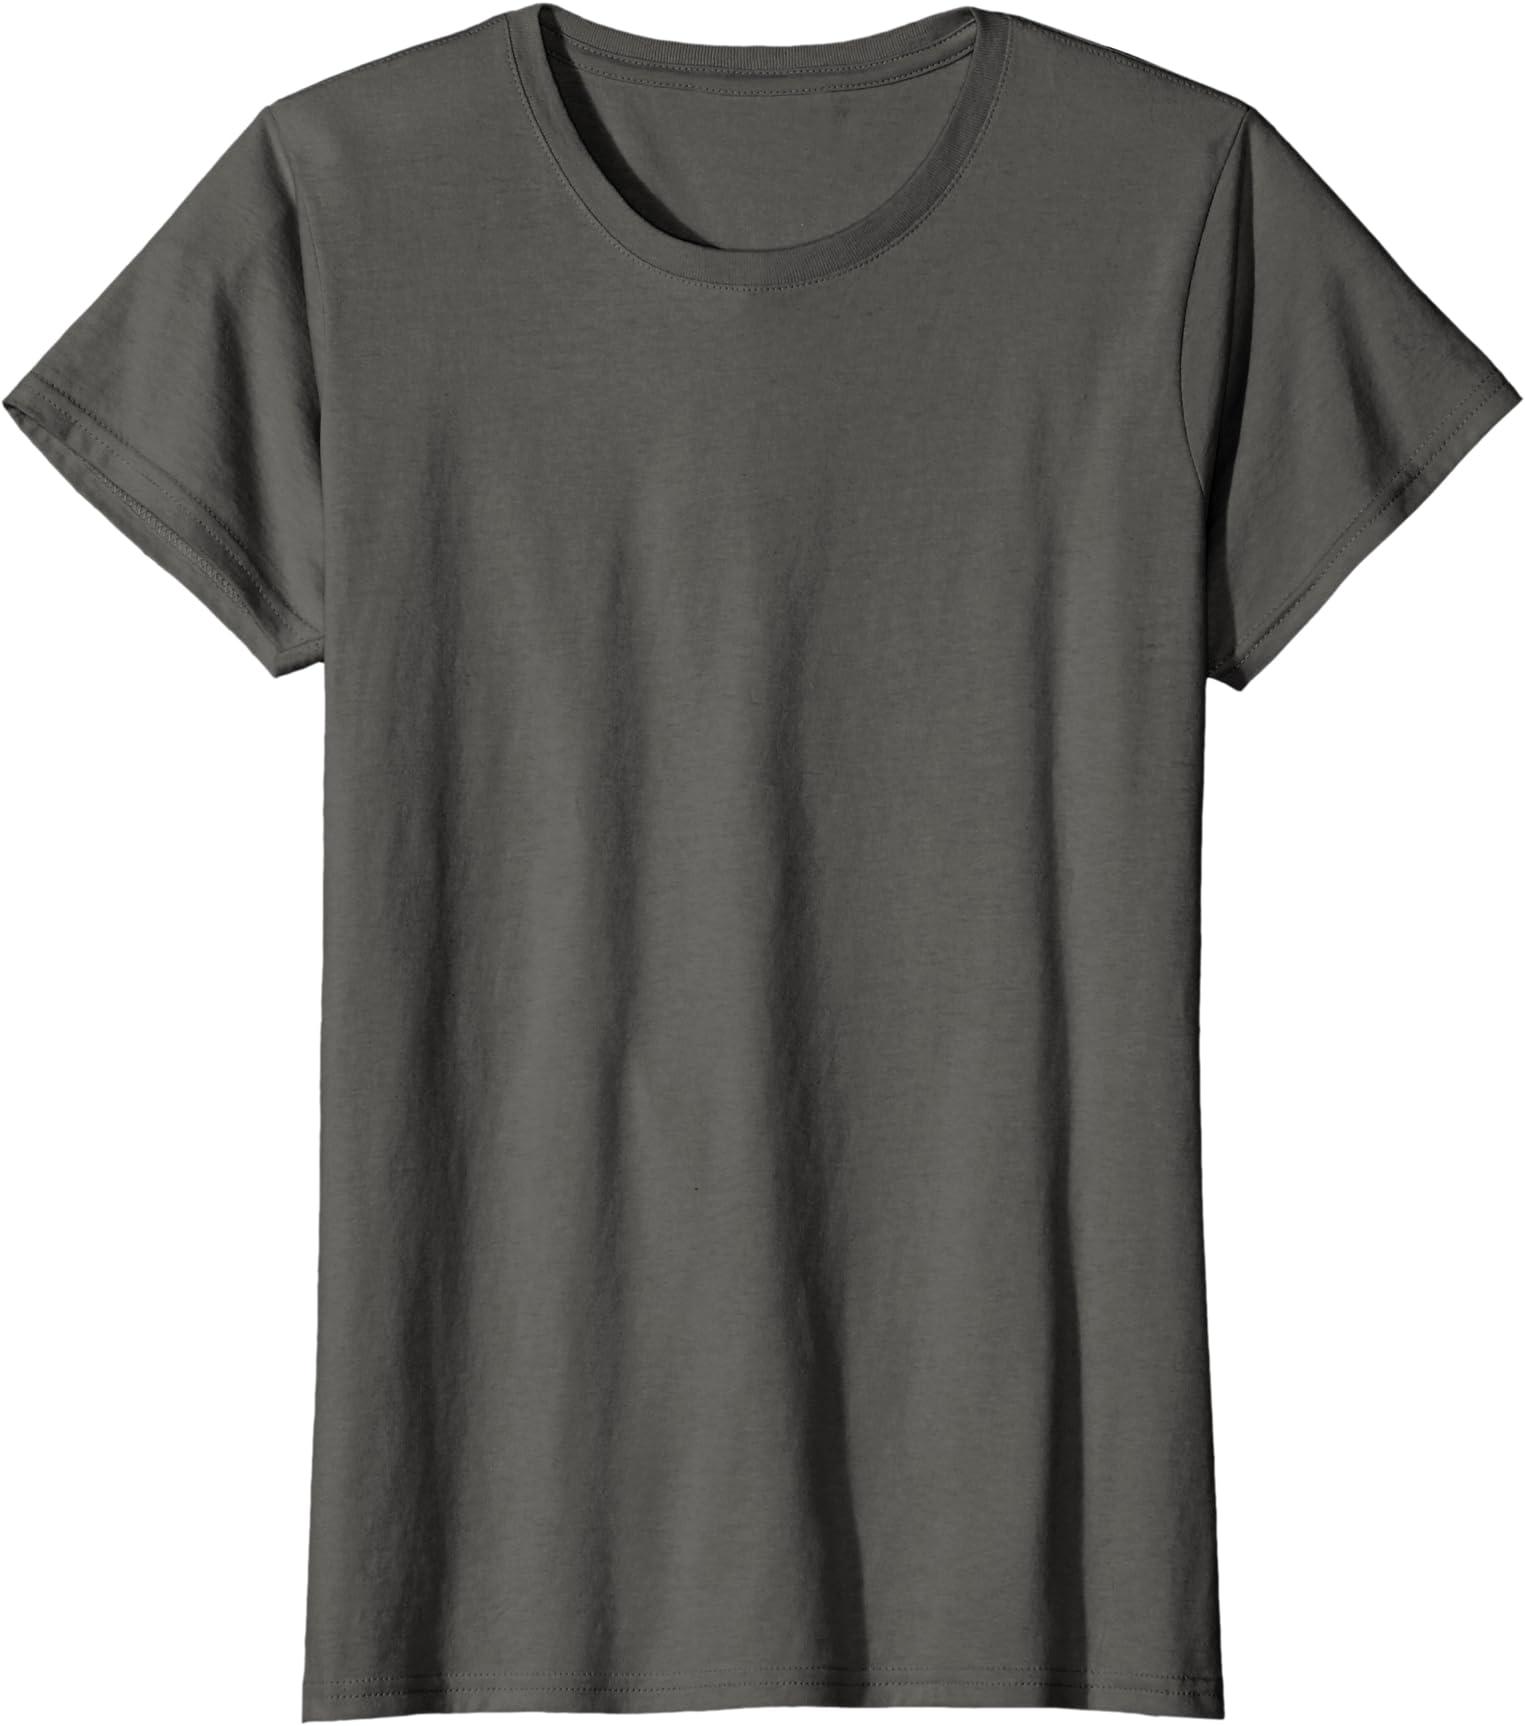 Mama Bear Black Childrens Cotton Red Short Sleeve Girls T-Shirt